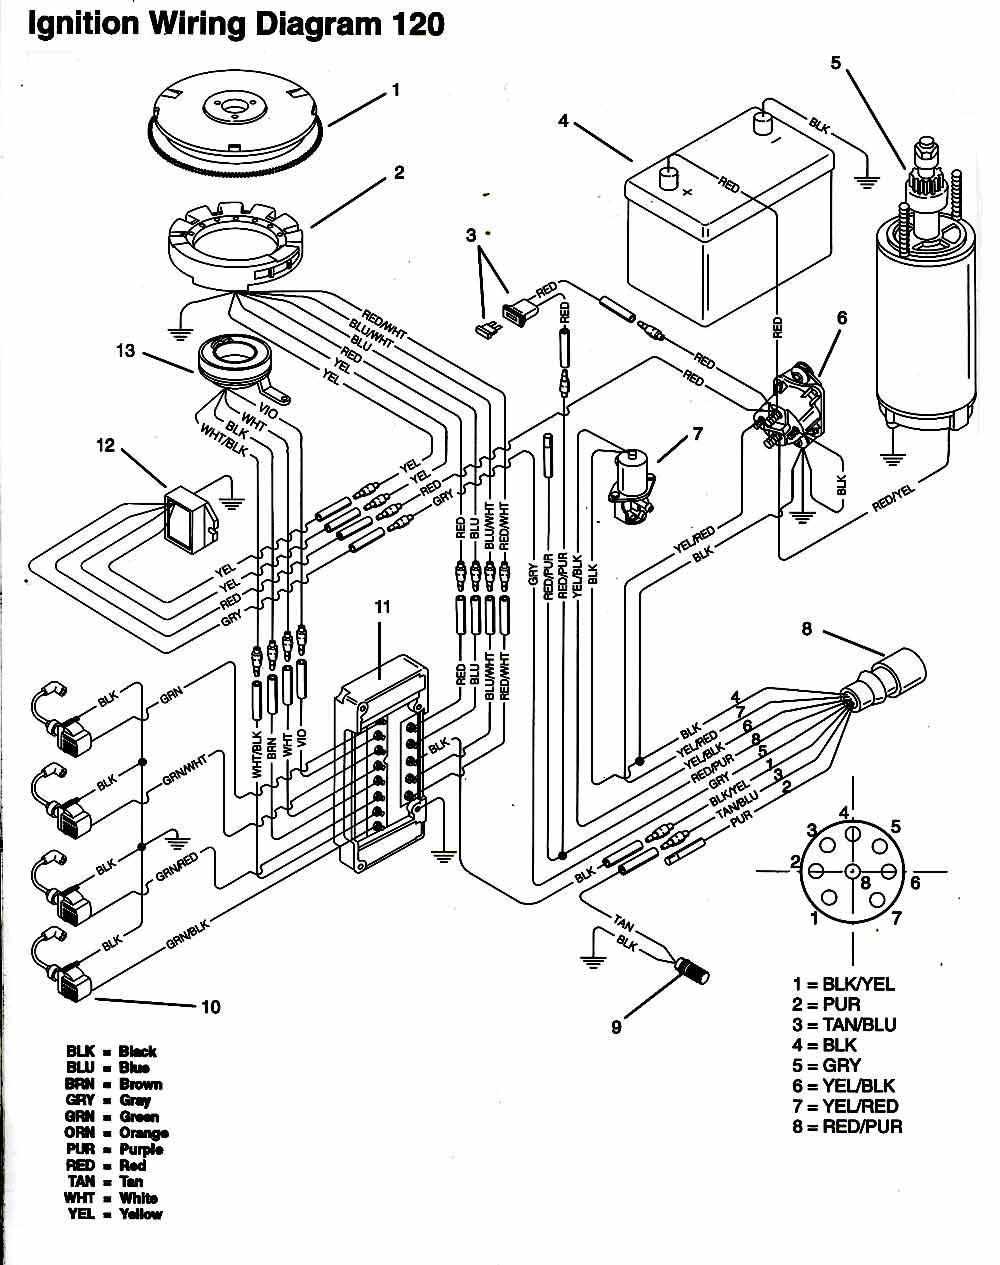 120 mercruiser ignition wiring diagram diy wiring diagrams u2022 rh aviomar co force 120 exhaust force